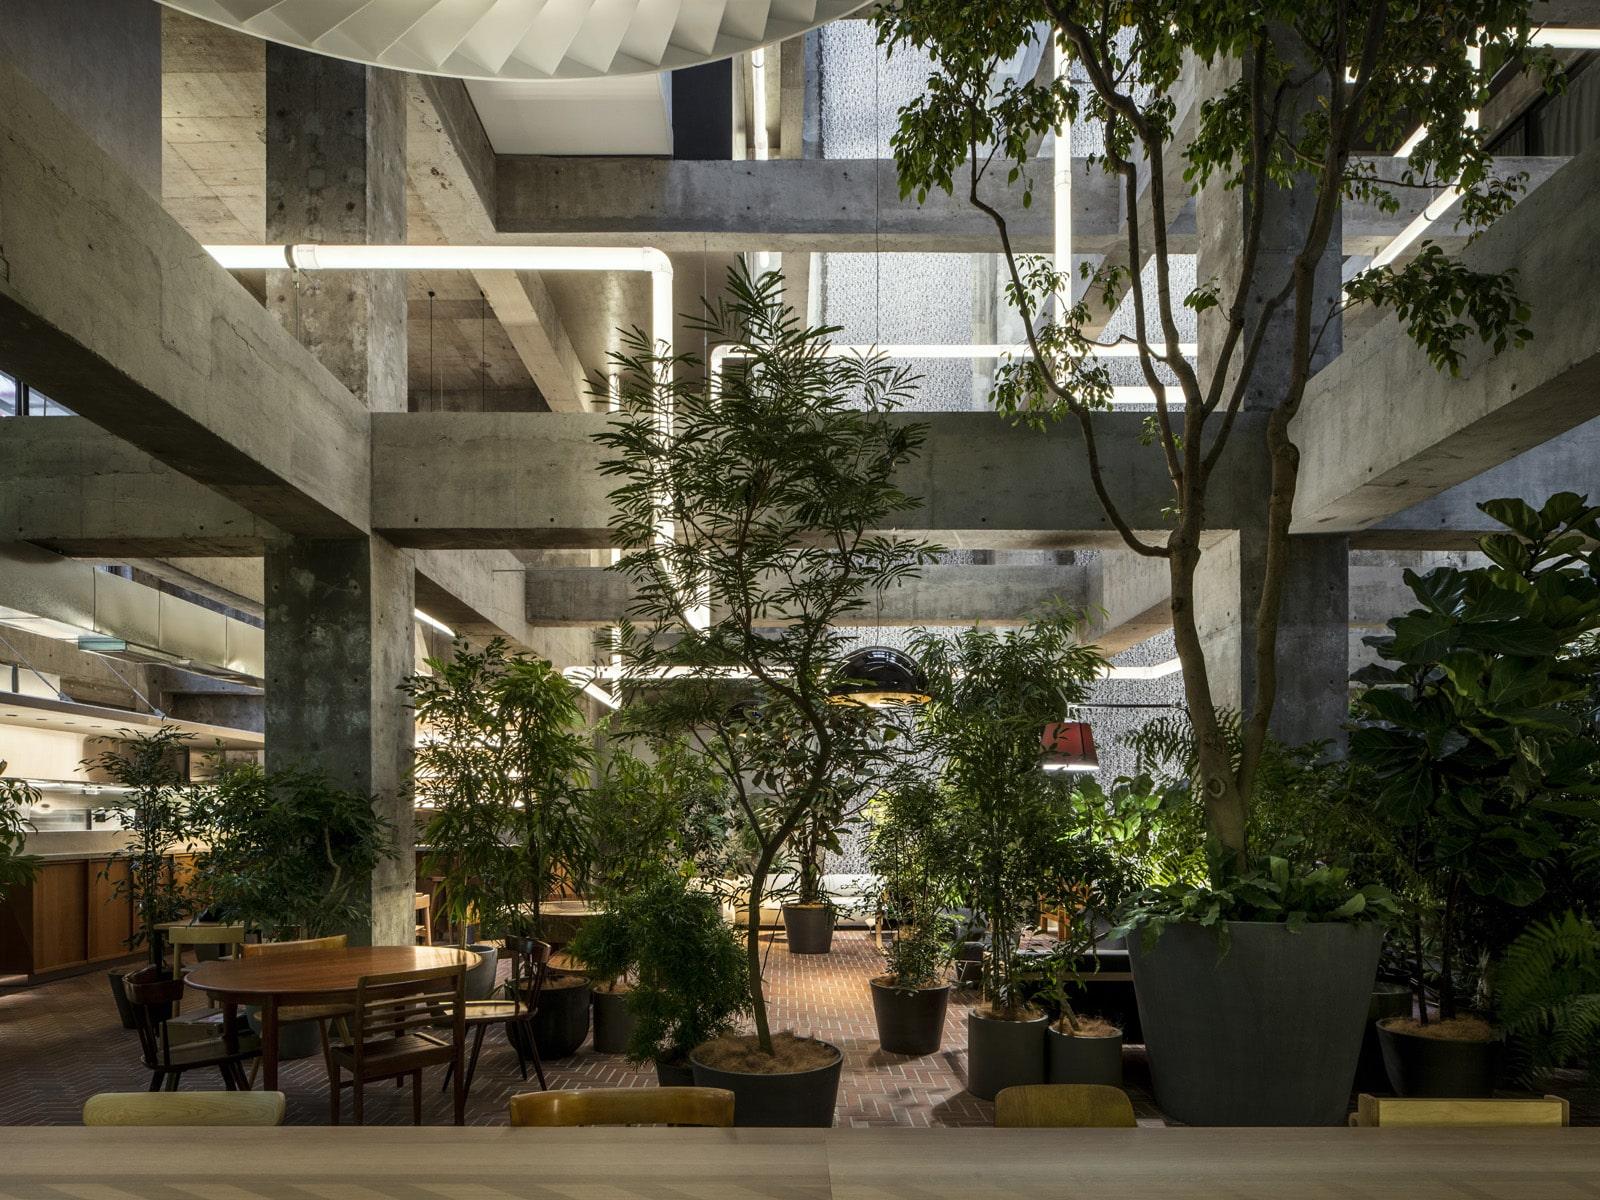 Shiroiya Hotel  - 20210816 SouFujimoto ShiroiyaHotel 03 35